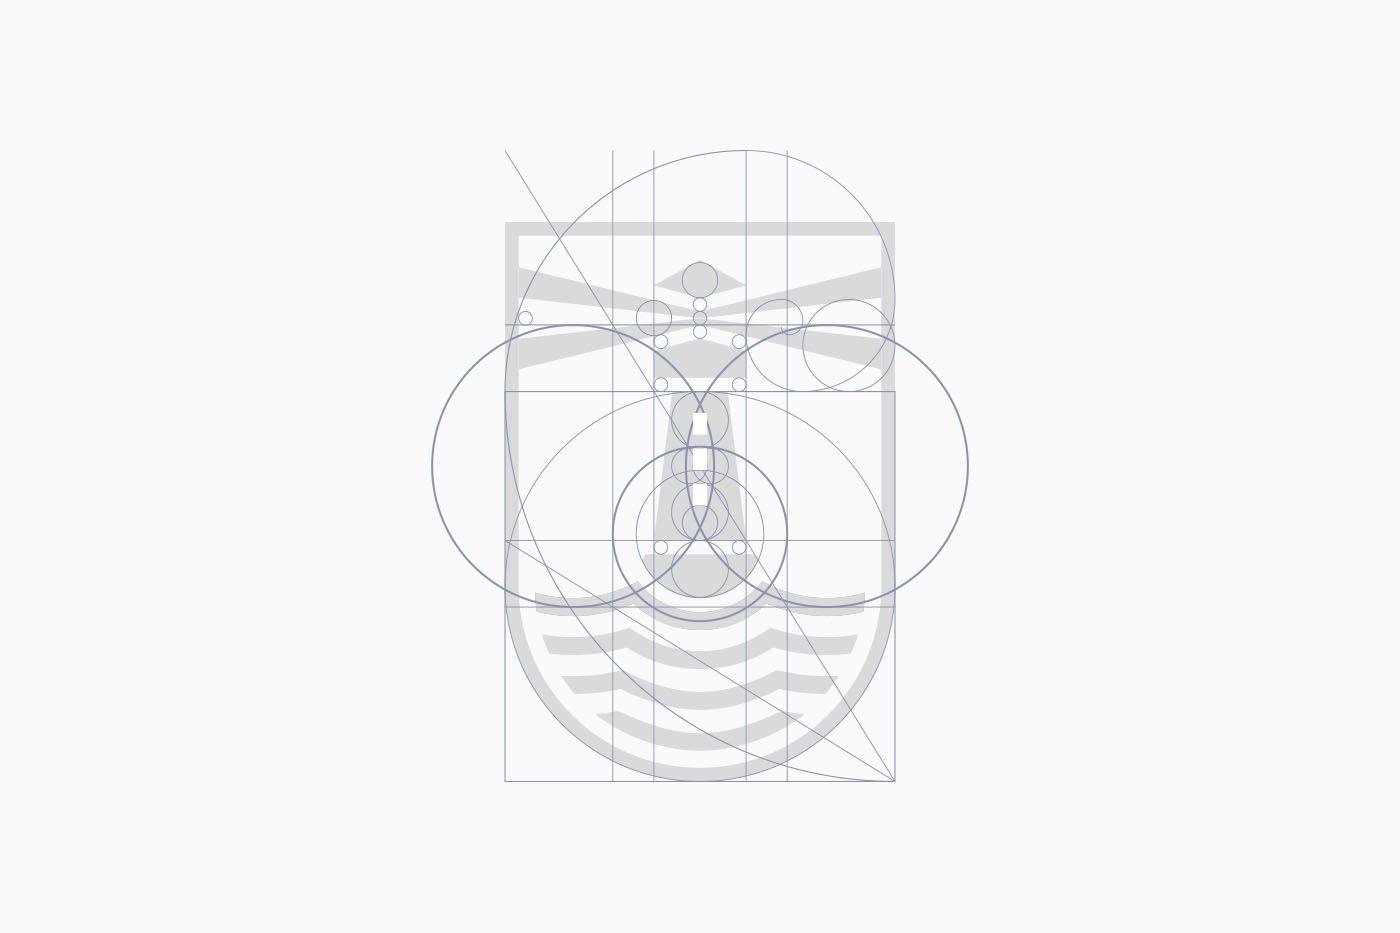 https://duktor.lu/wp-content/uploads/2020/10/duktor-projekt-heintz_van_landewyck_13.jpg